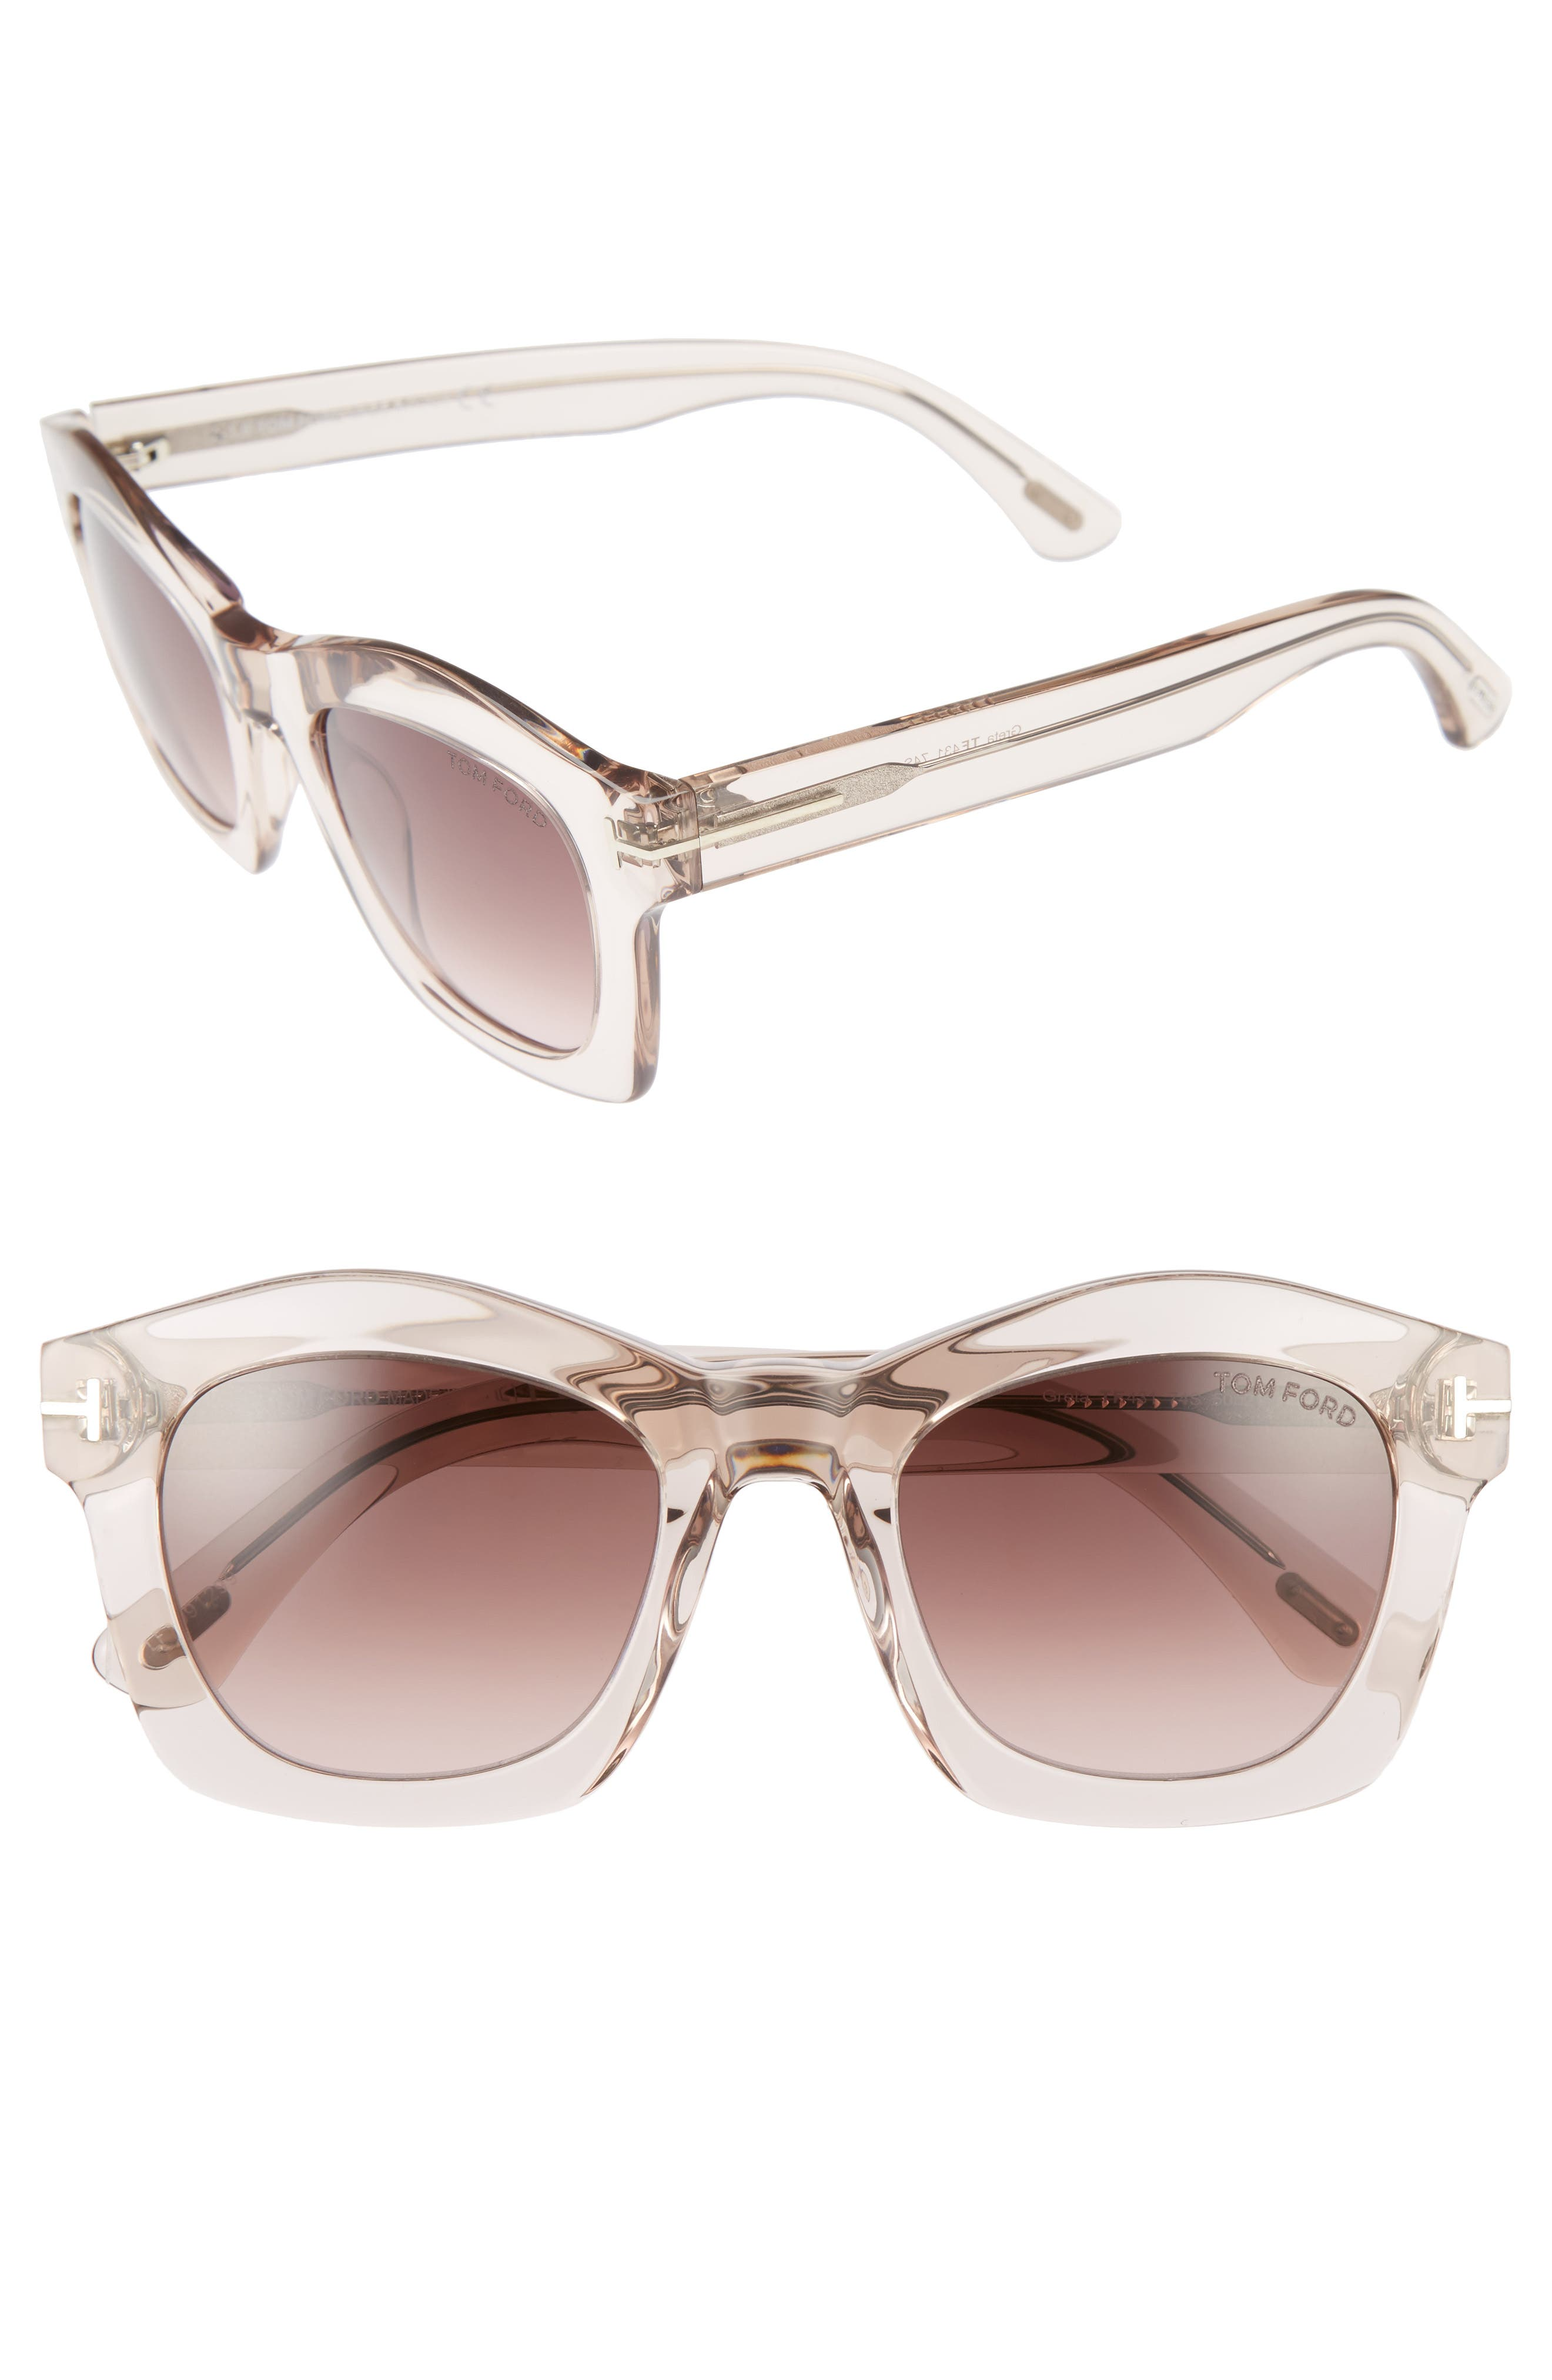 Alternate Image 1 Selected - Tom Ford 'Greta' 50mm Sunglasses